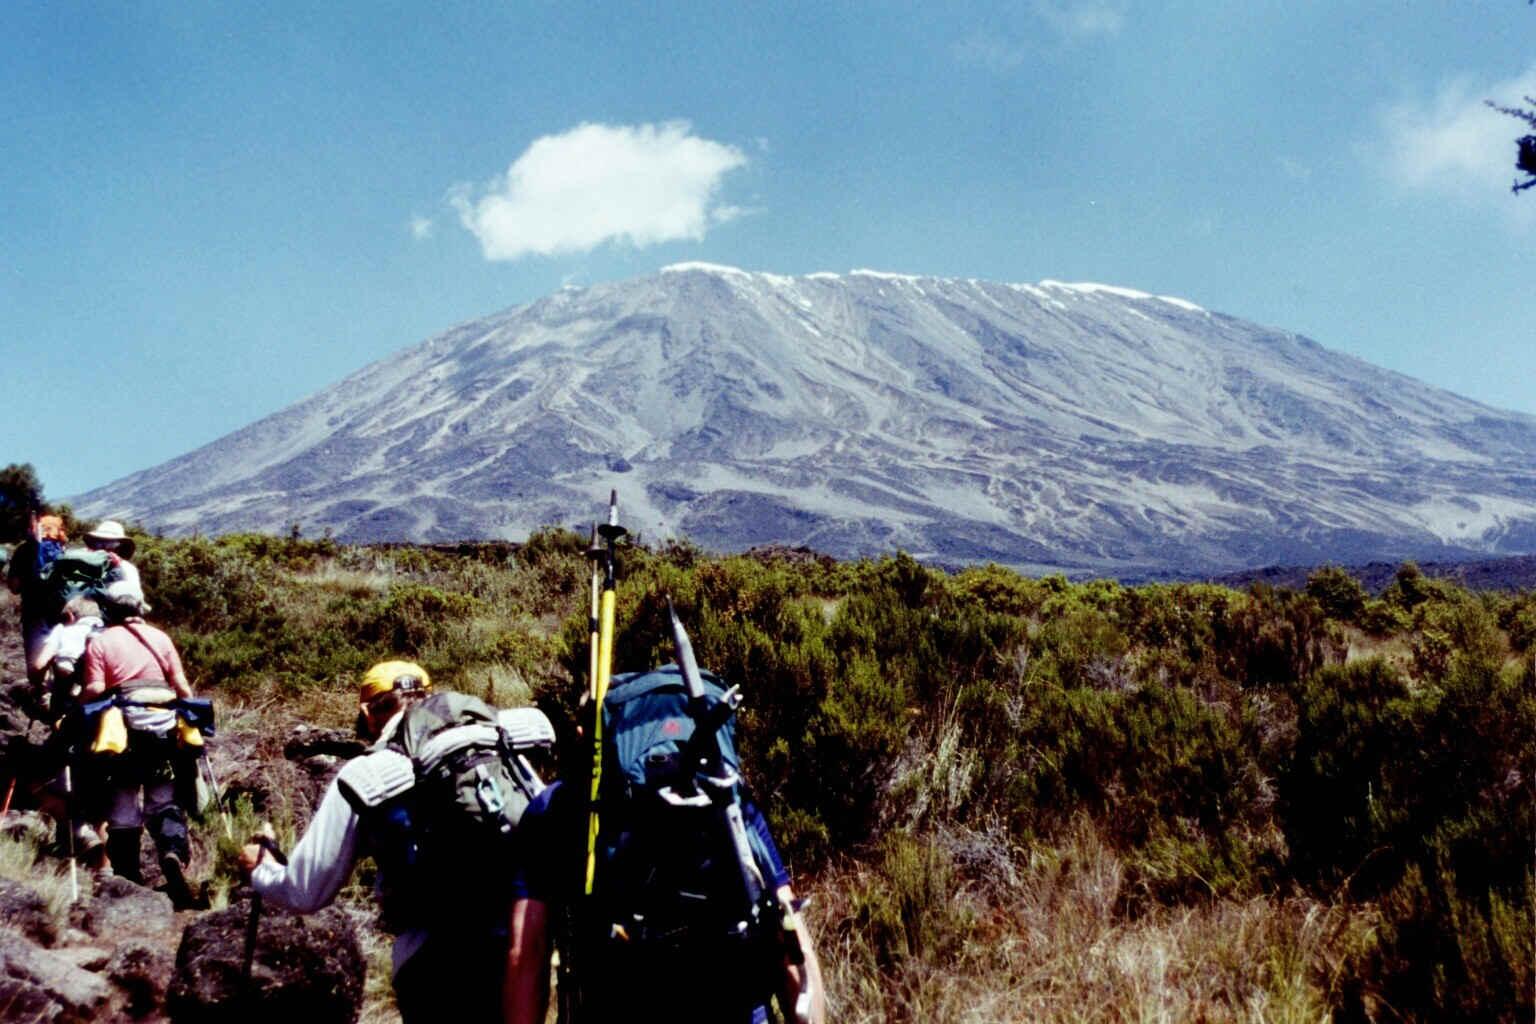 wp-content/uploads/itineraries/Kilimanjaro/kili-rongai-day2.jpg